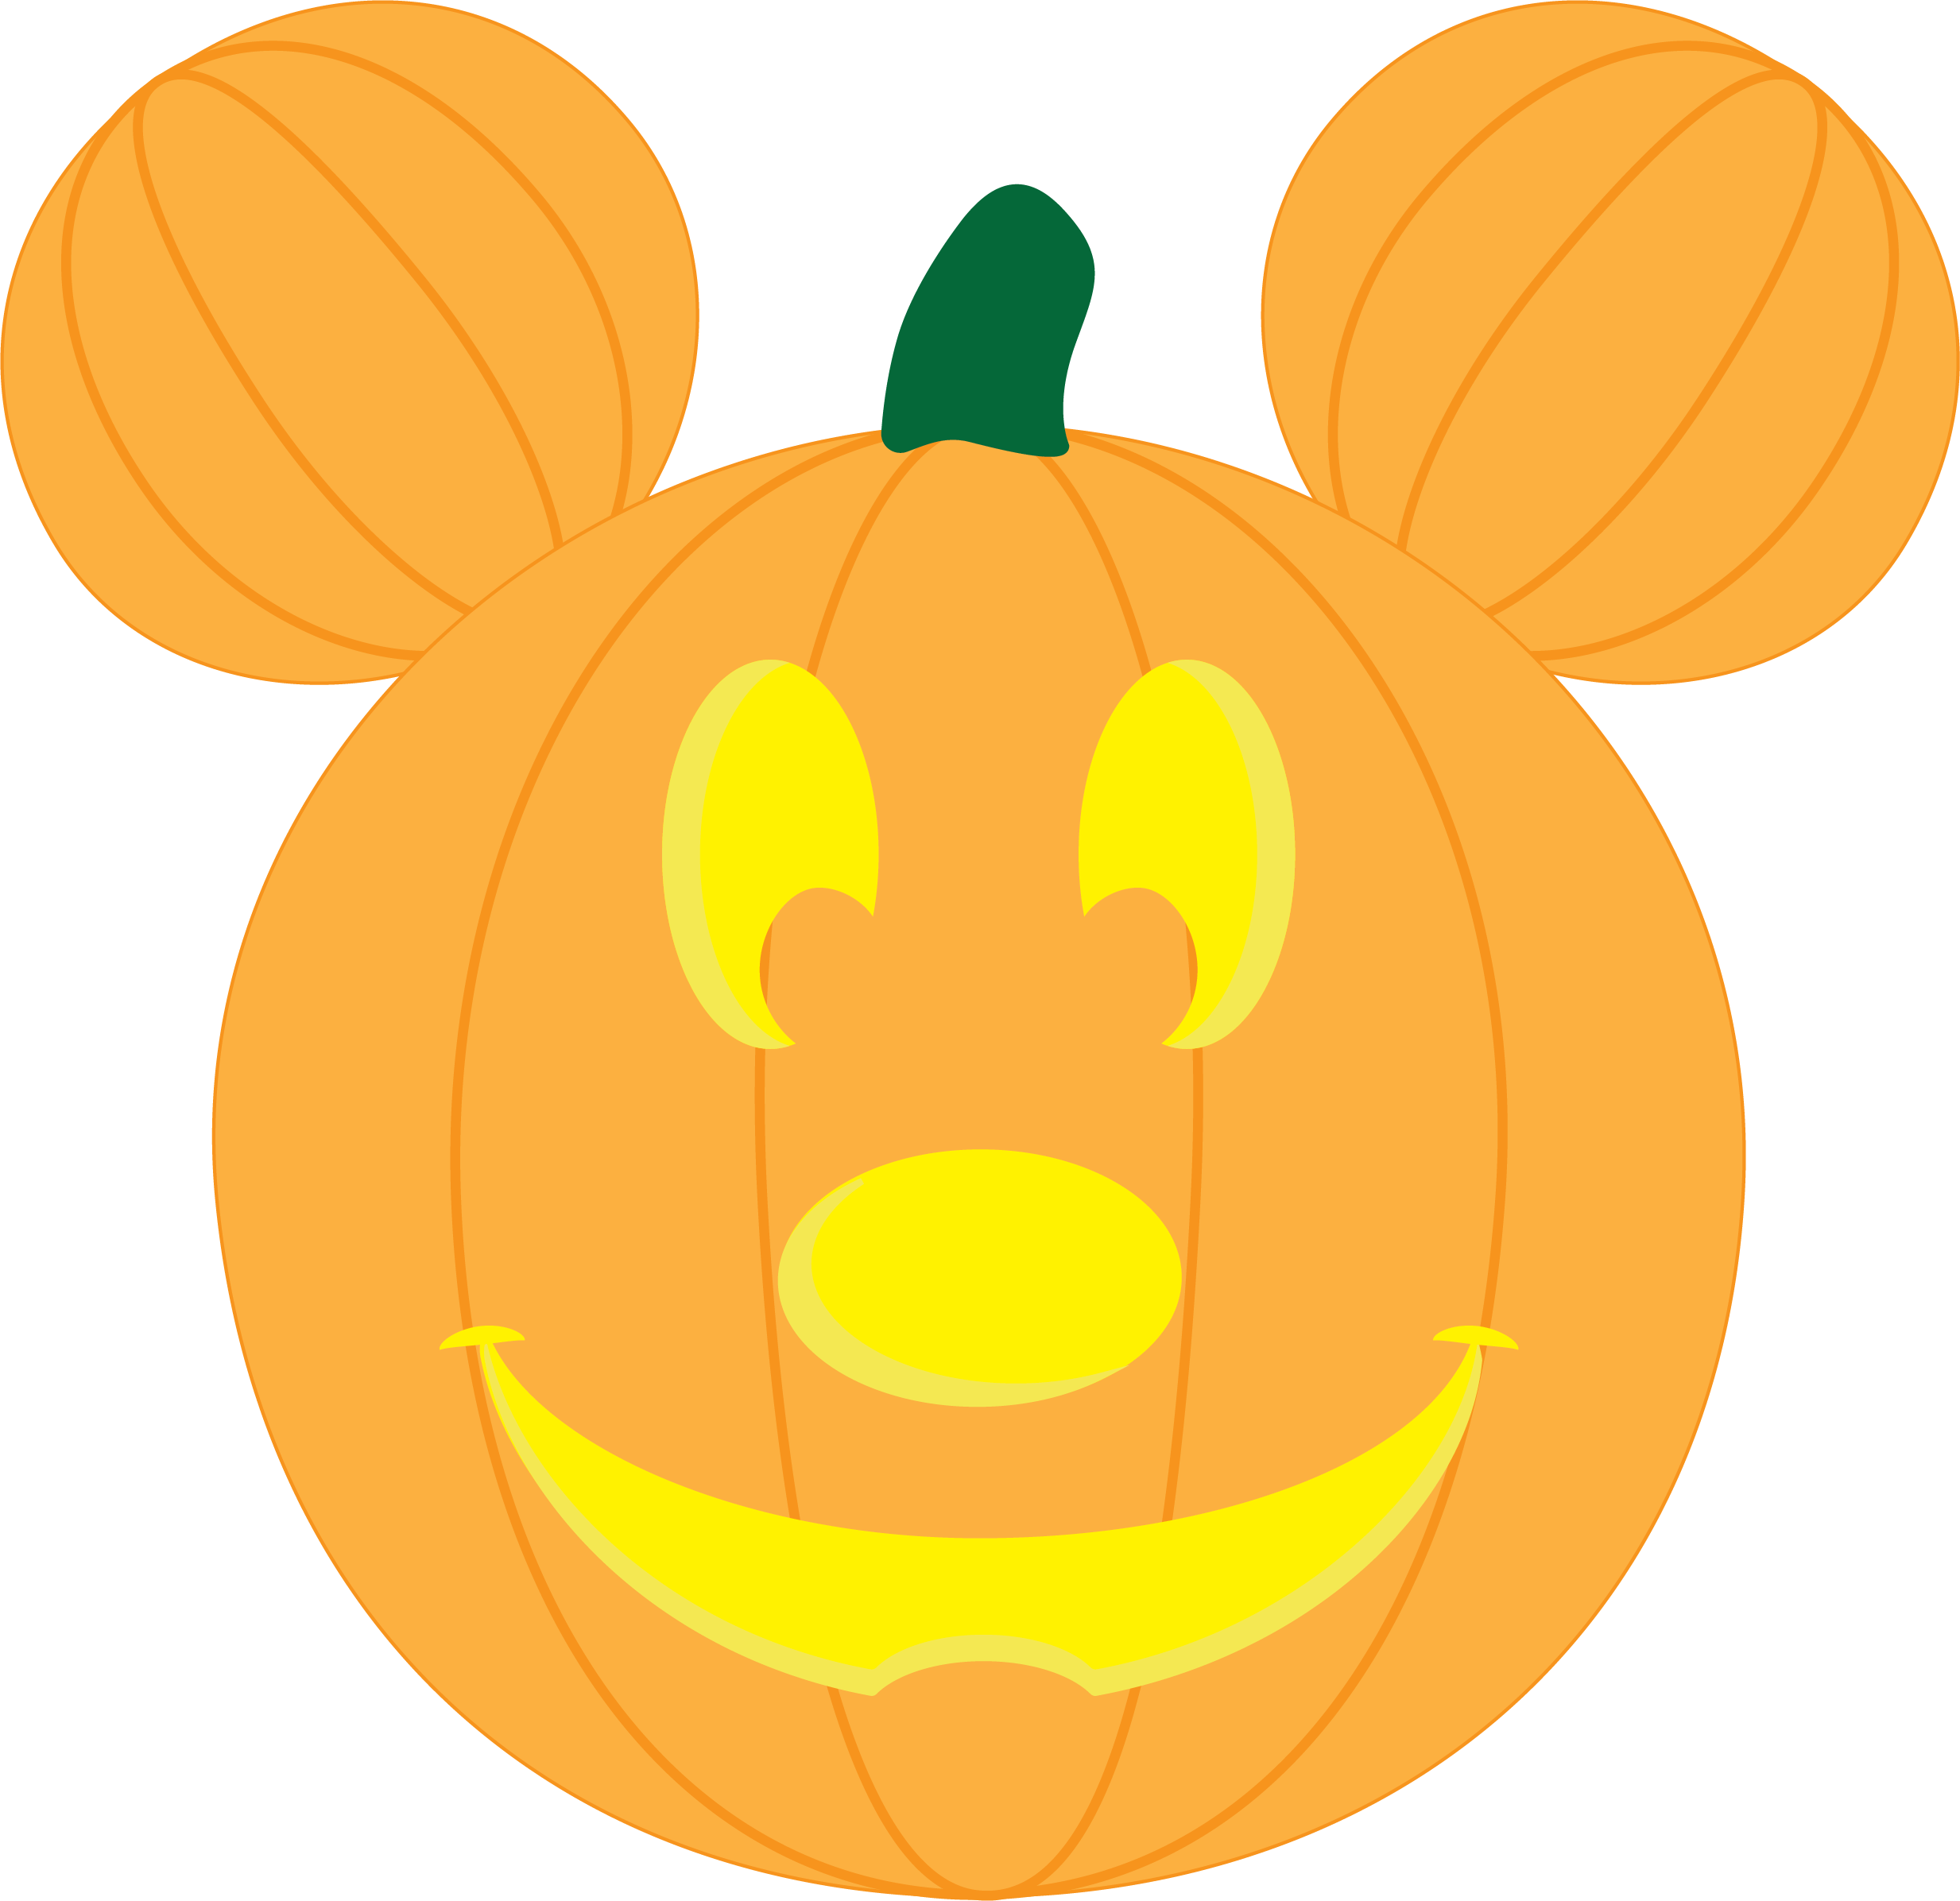 Pumpkin shirt clipart svg black and white download DIY Mickey Pumpkin Shirt - Liz on Call svg black and white download